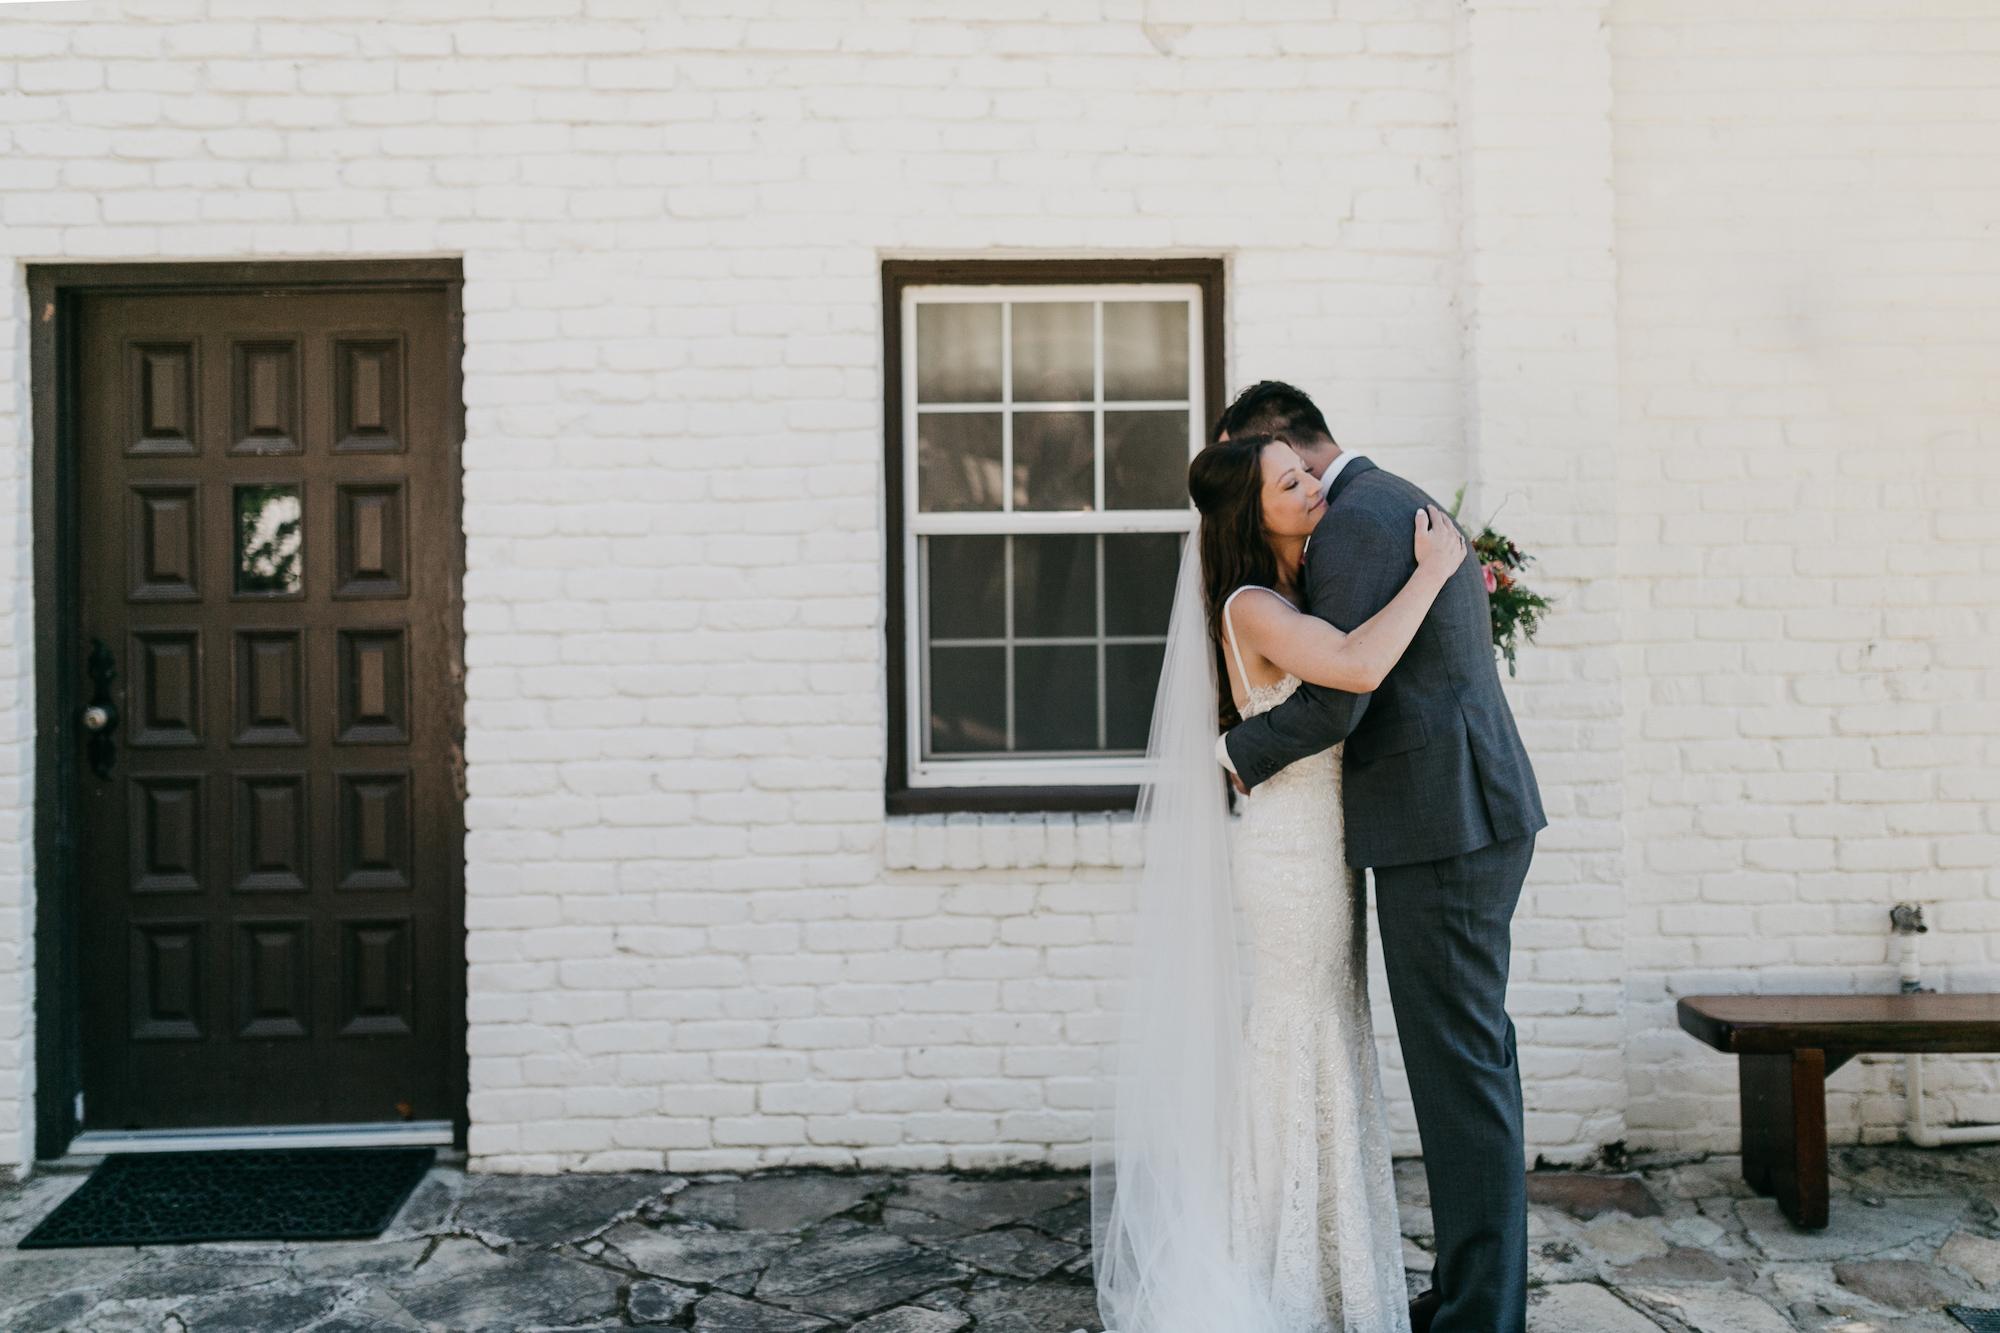 anvil-vineyards-wedding-photographer172.jpg